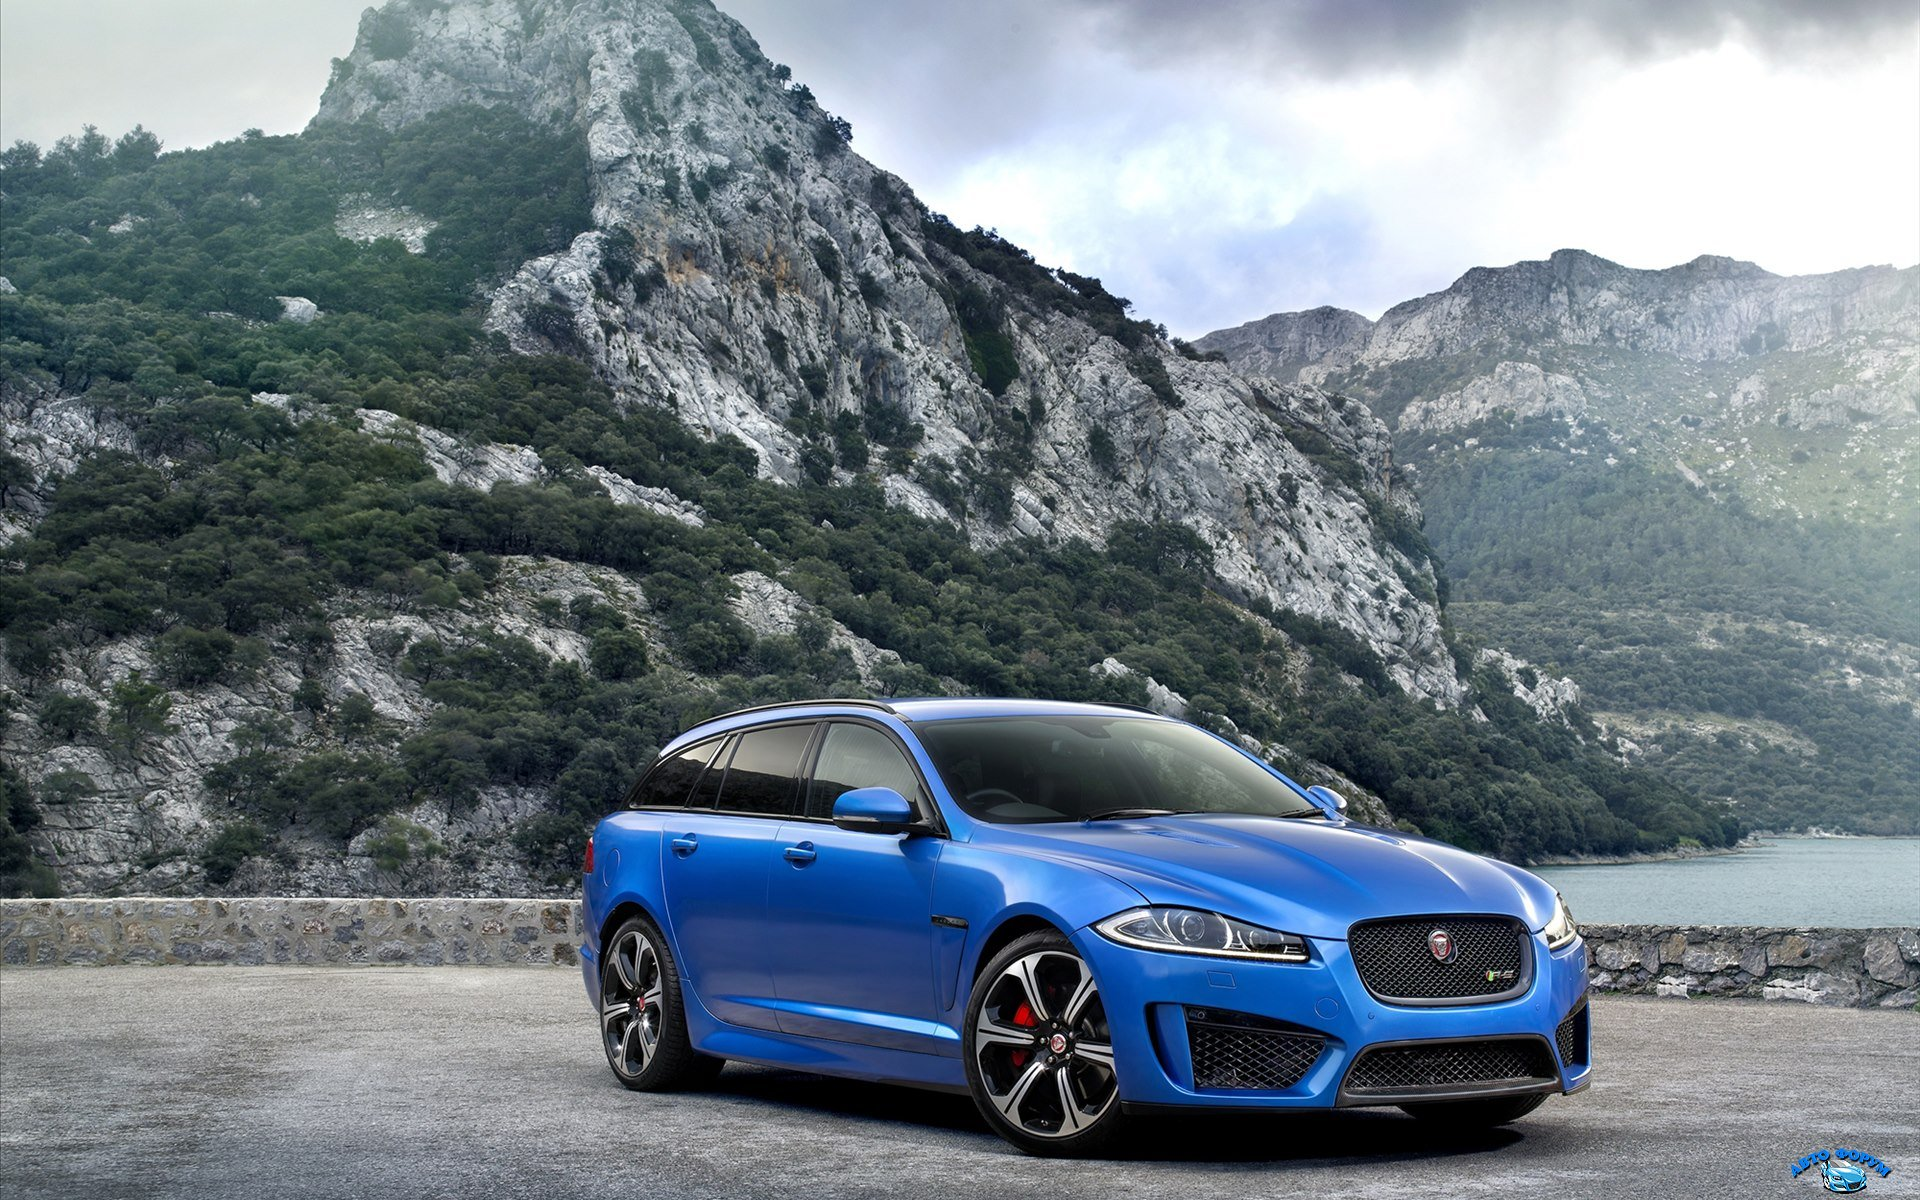 Jaguar-XFR-S-Sportbrake-2015-widescreen-25.jpg